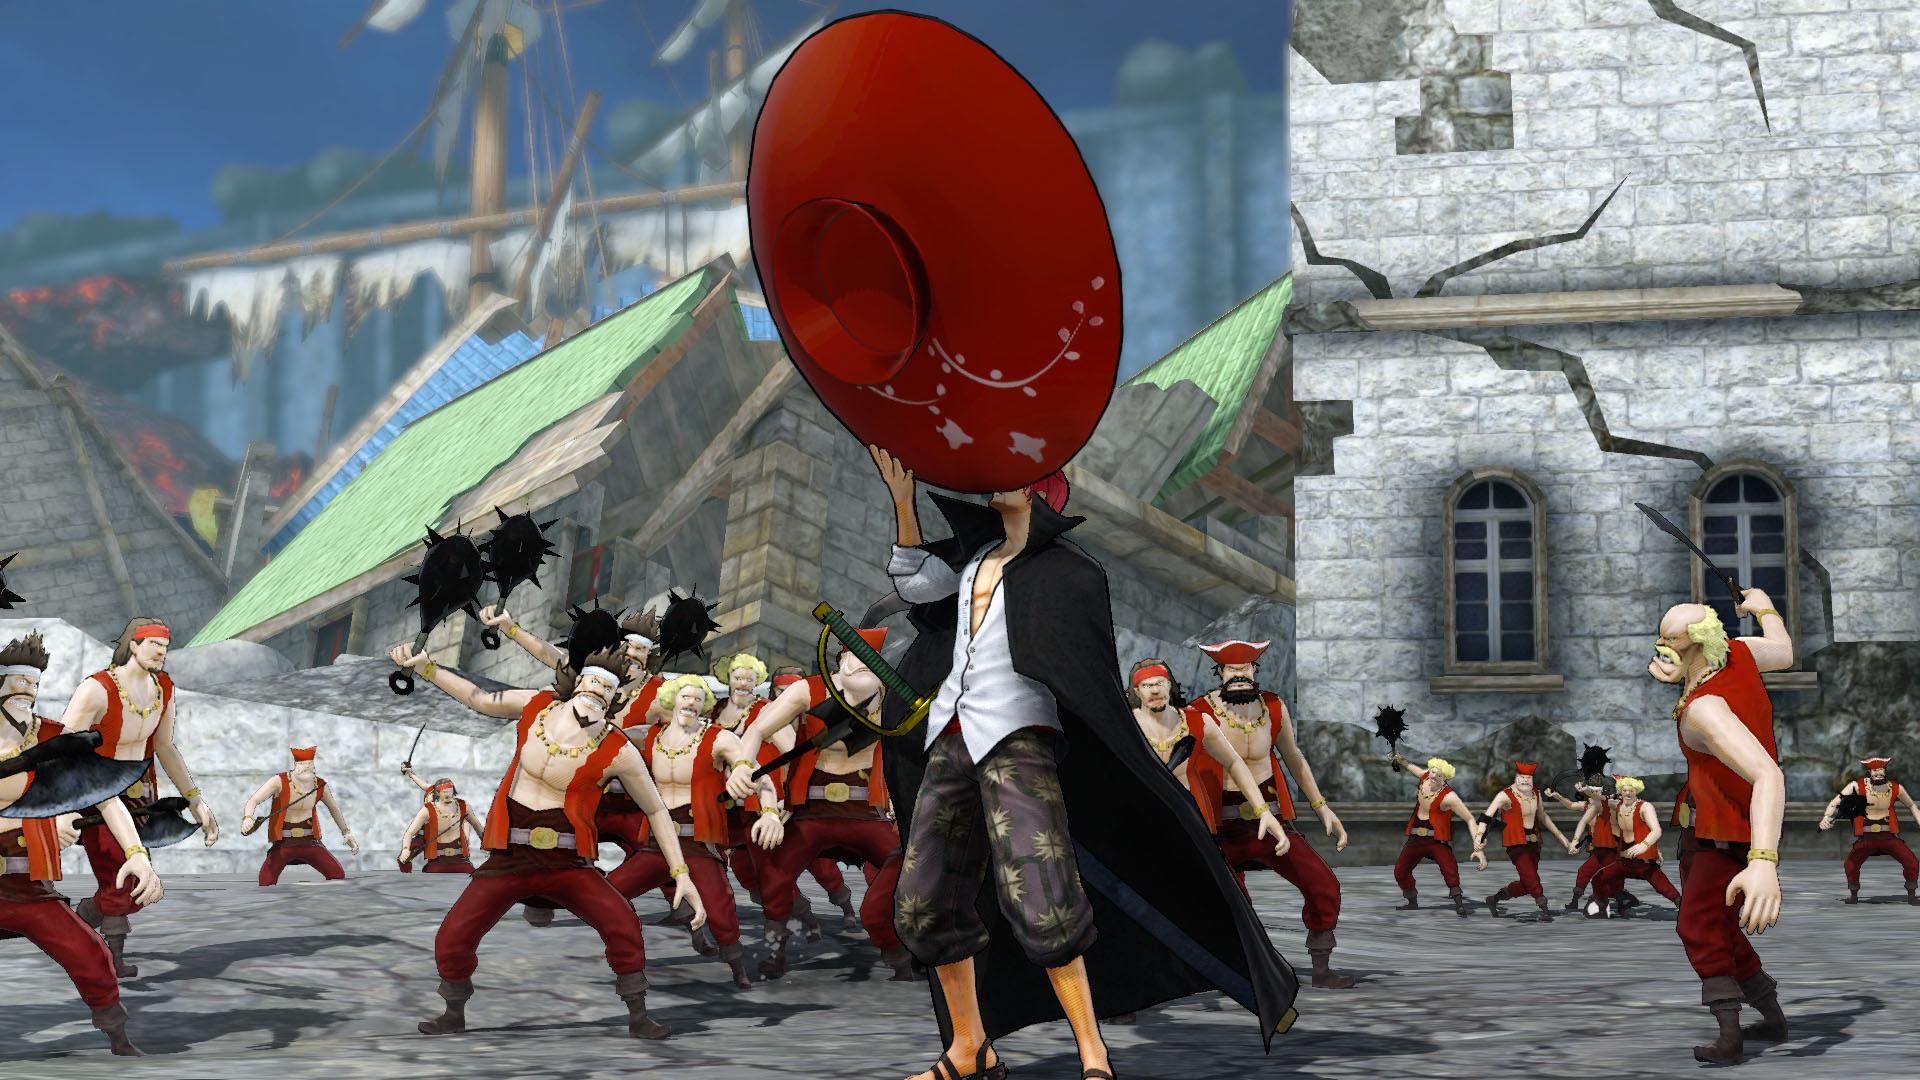 Como Dibujar Los Brawlers De Brawl Star En Hoja Cuadriculada: One Piece: Pirate Warriors 3 Review (PS4)